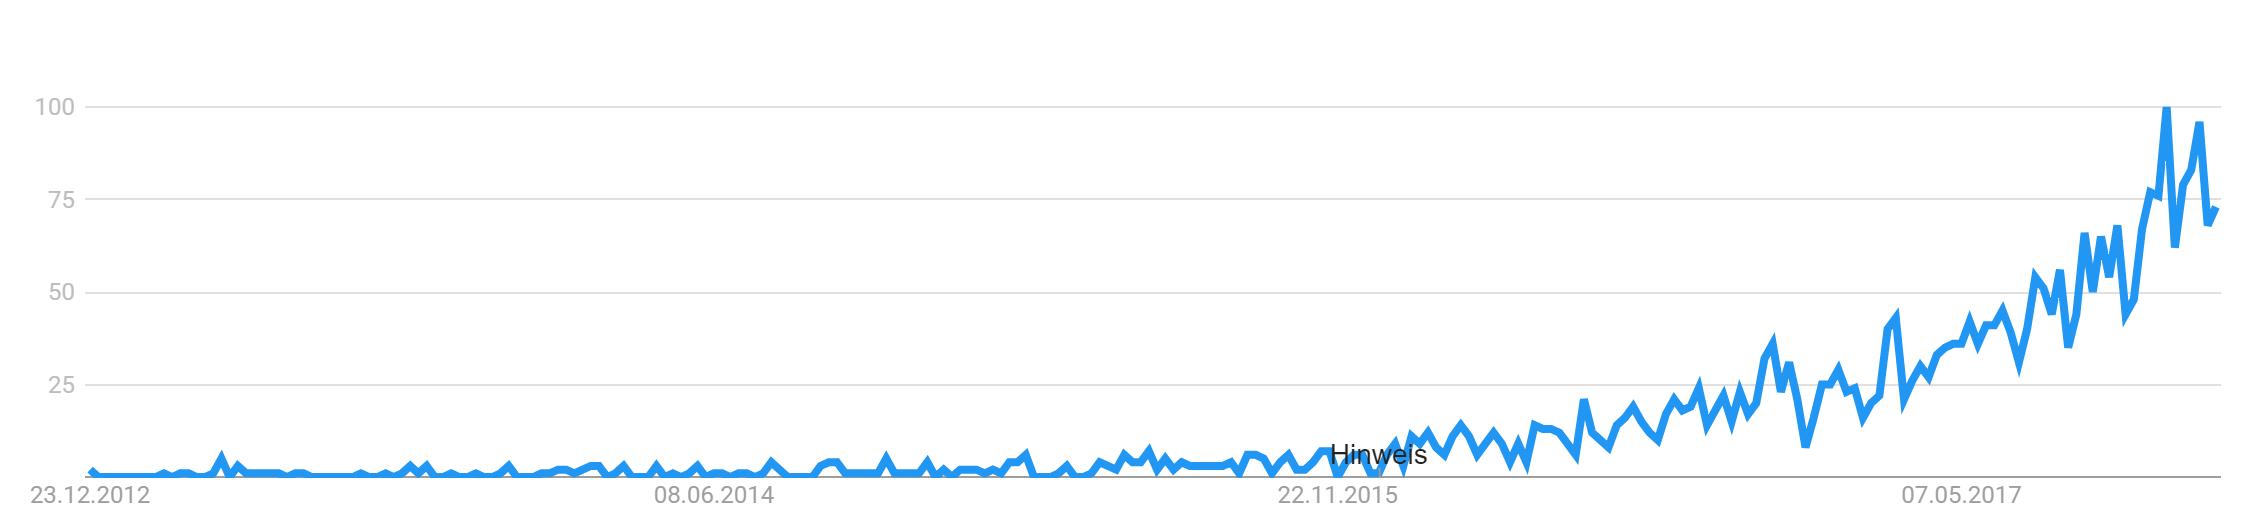 Influencer Marketing Trend 2017